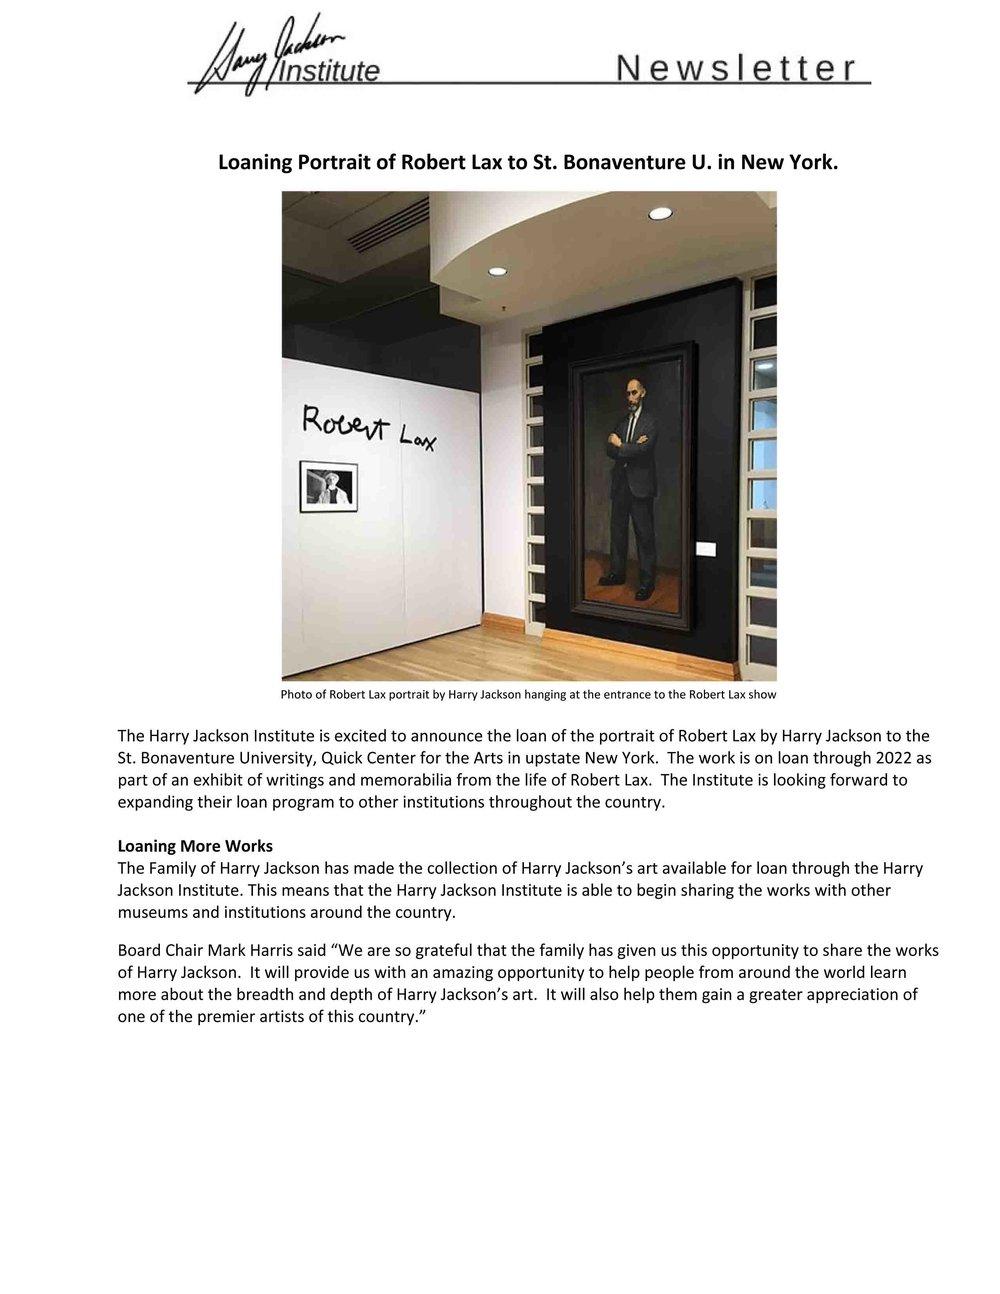 2017_10_01 Harry Jackson Iinstitute Newsletter-3.jpg